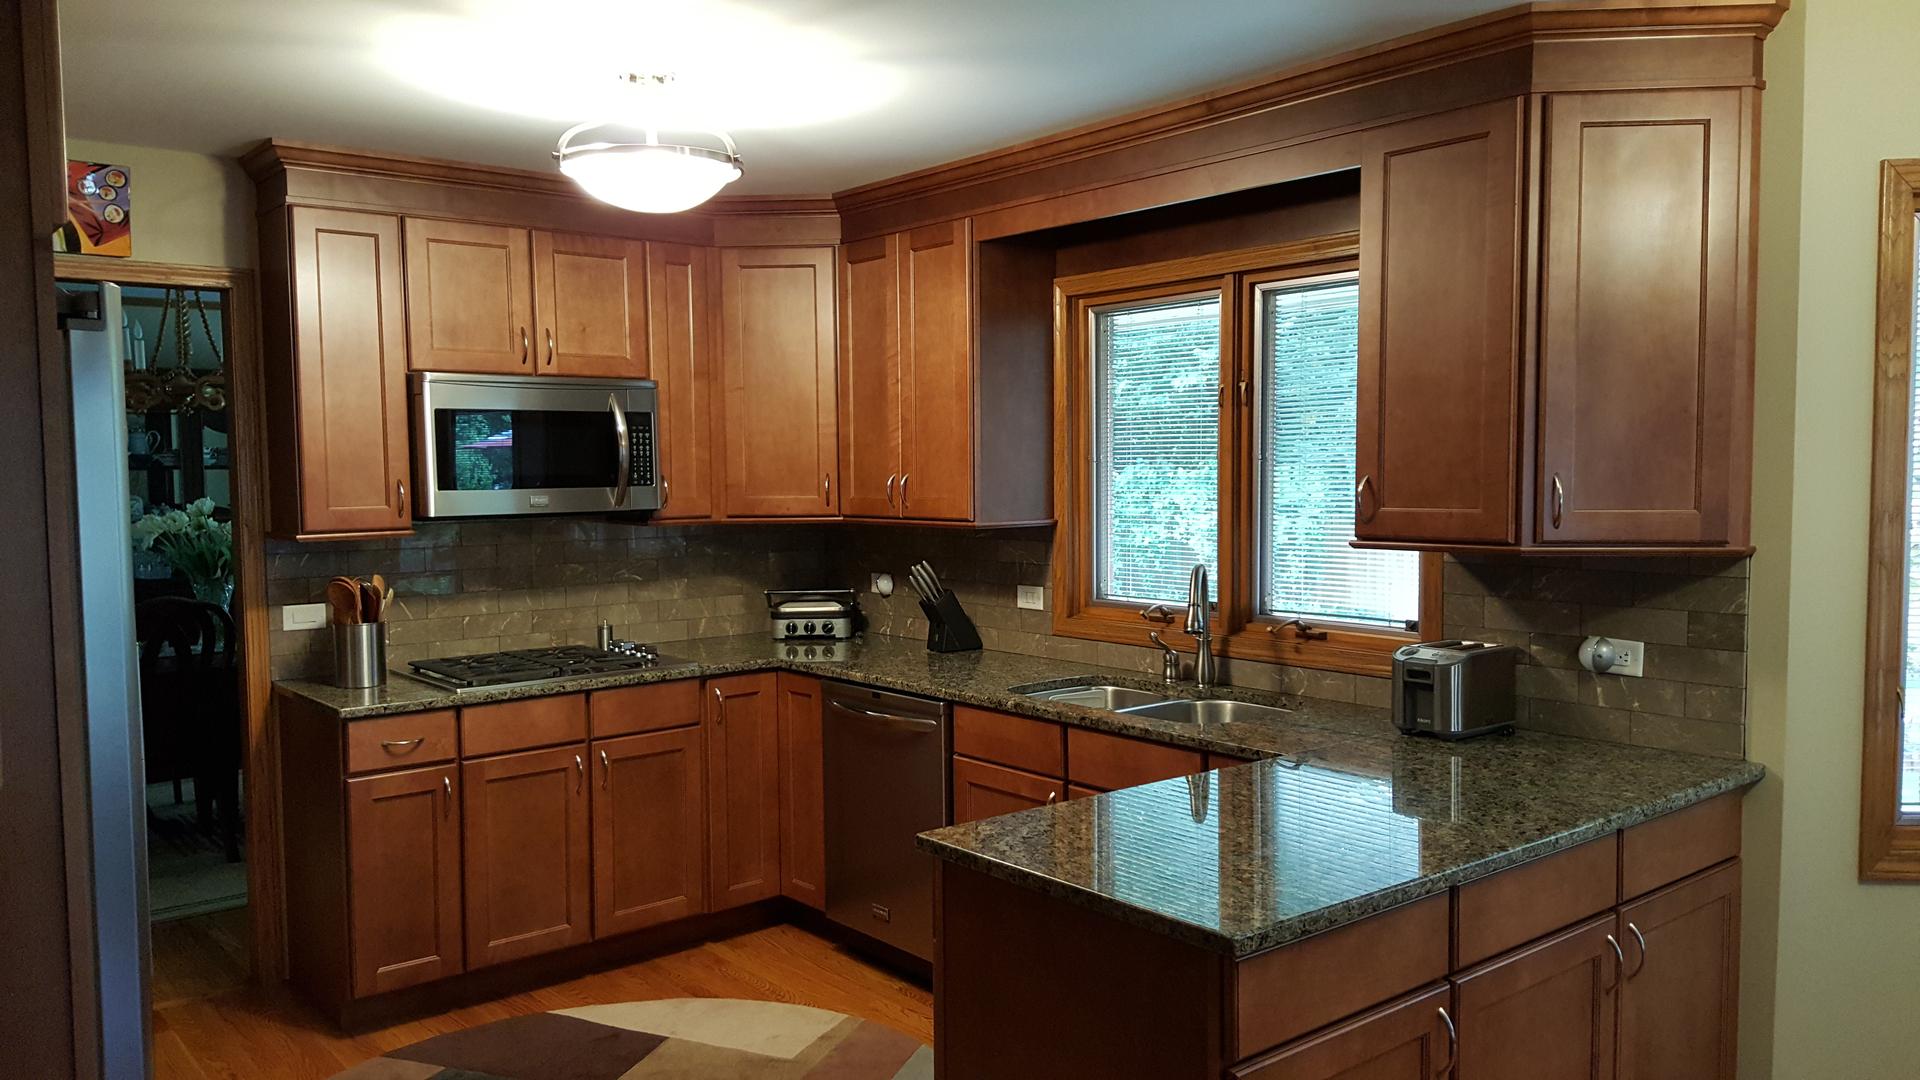 Complex Woodwork Kitchen Cabinet Vanities Cabinets Hardware